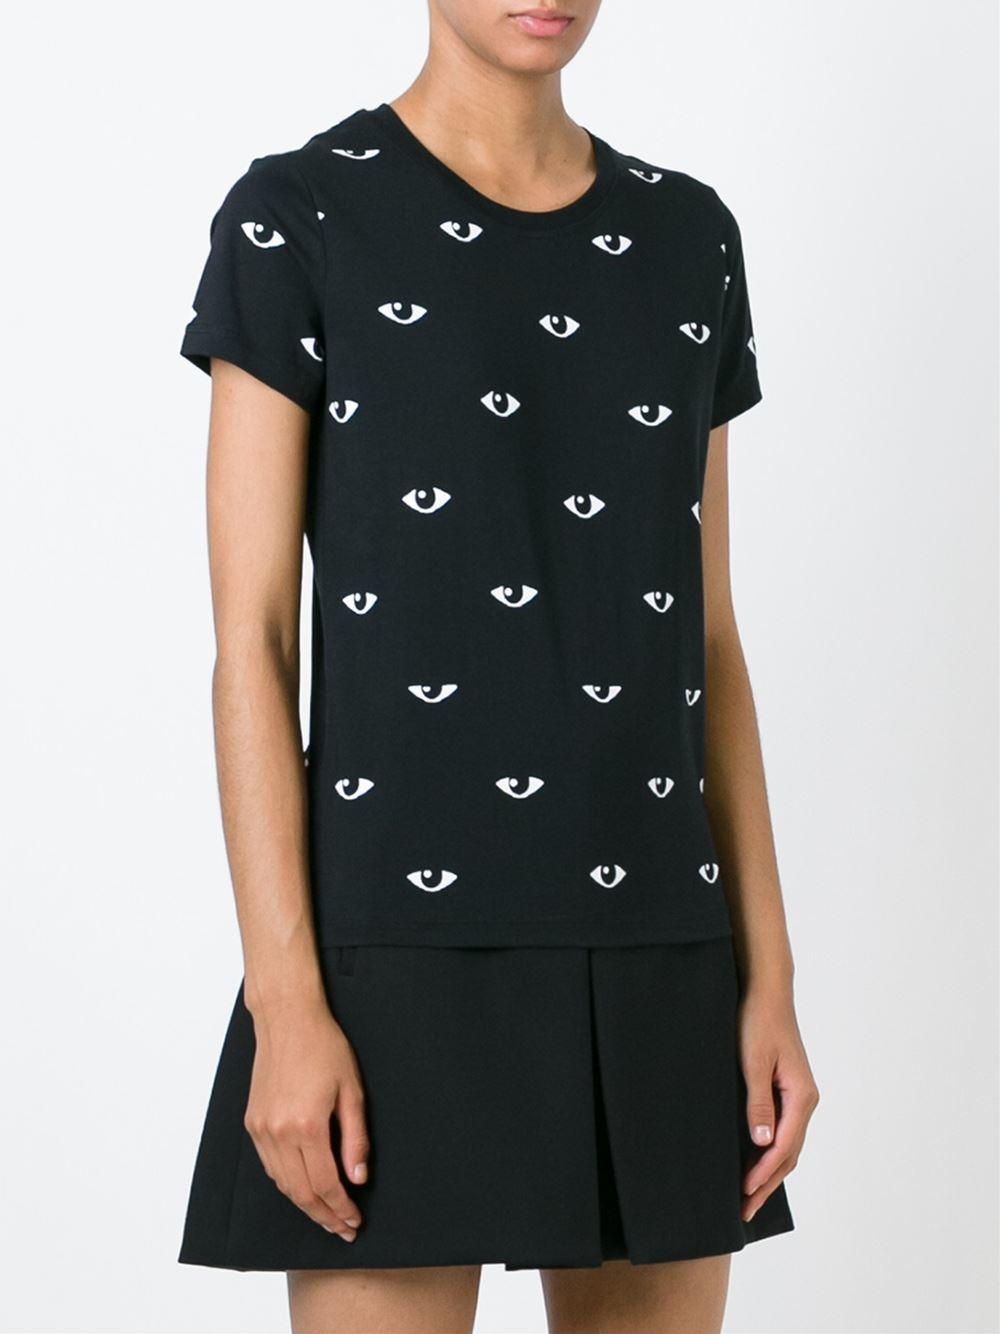 kenzo 39 eyes 39 t shirt in black lyst. Black Bedroom Furniture Sets. Home Design Ideas